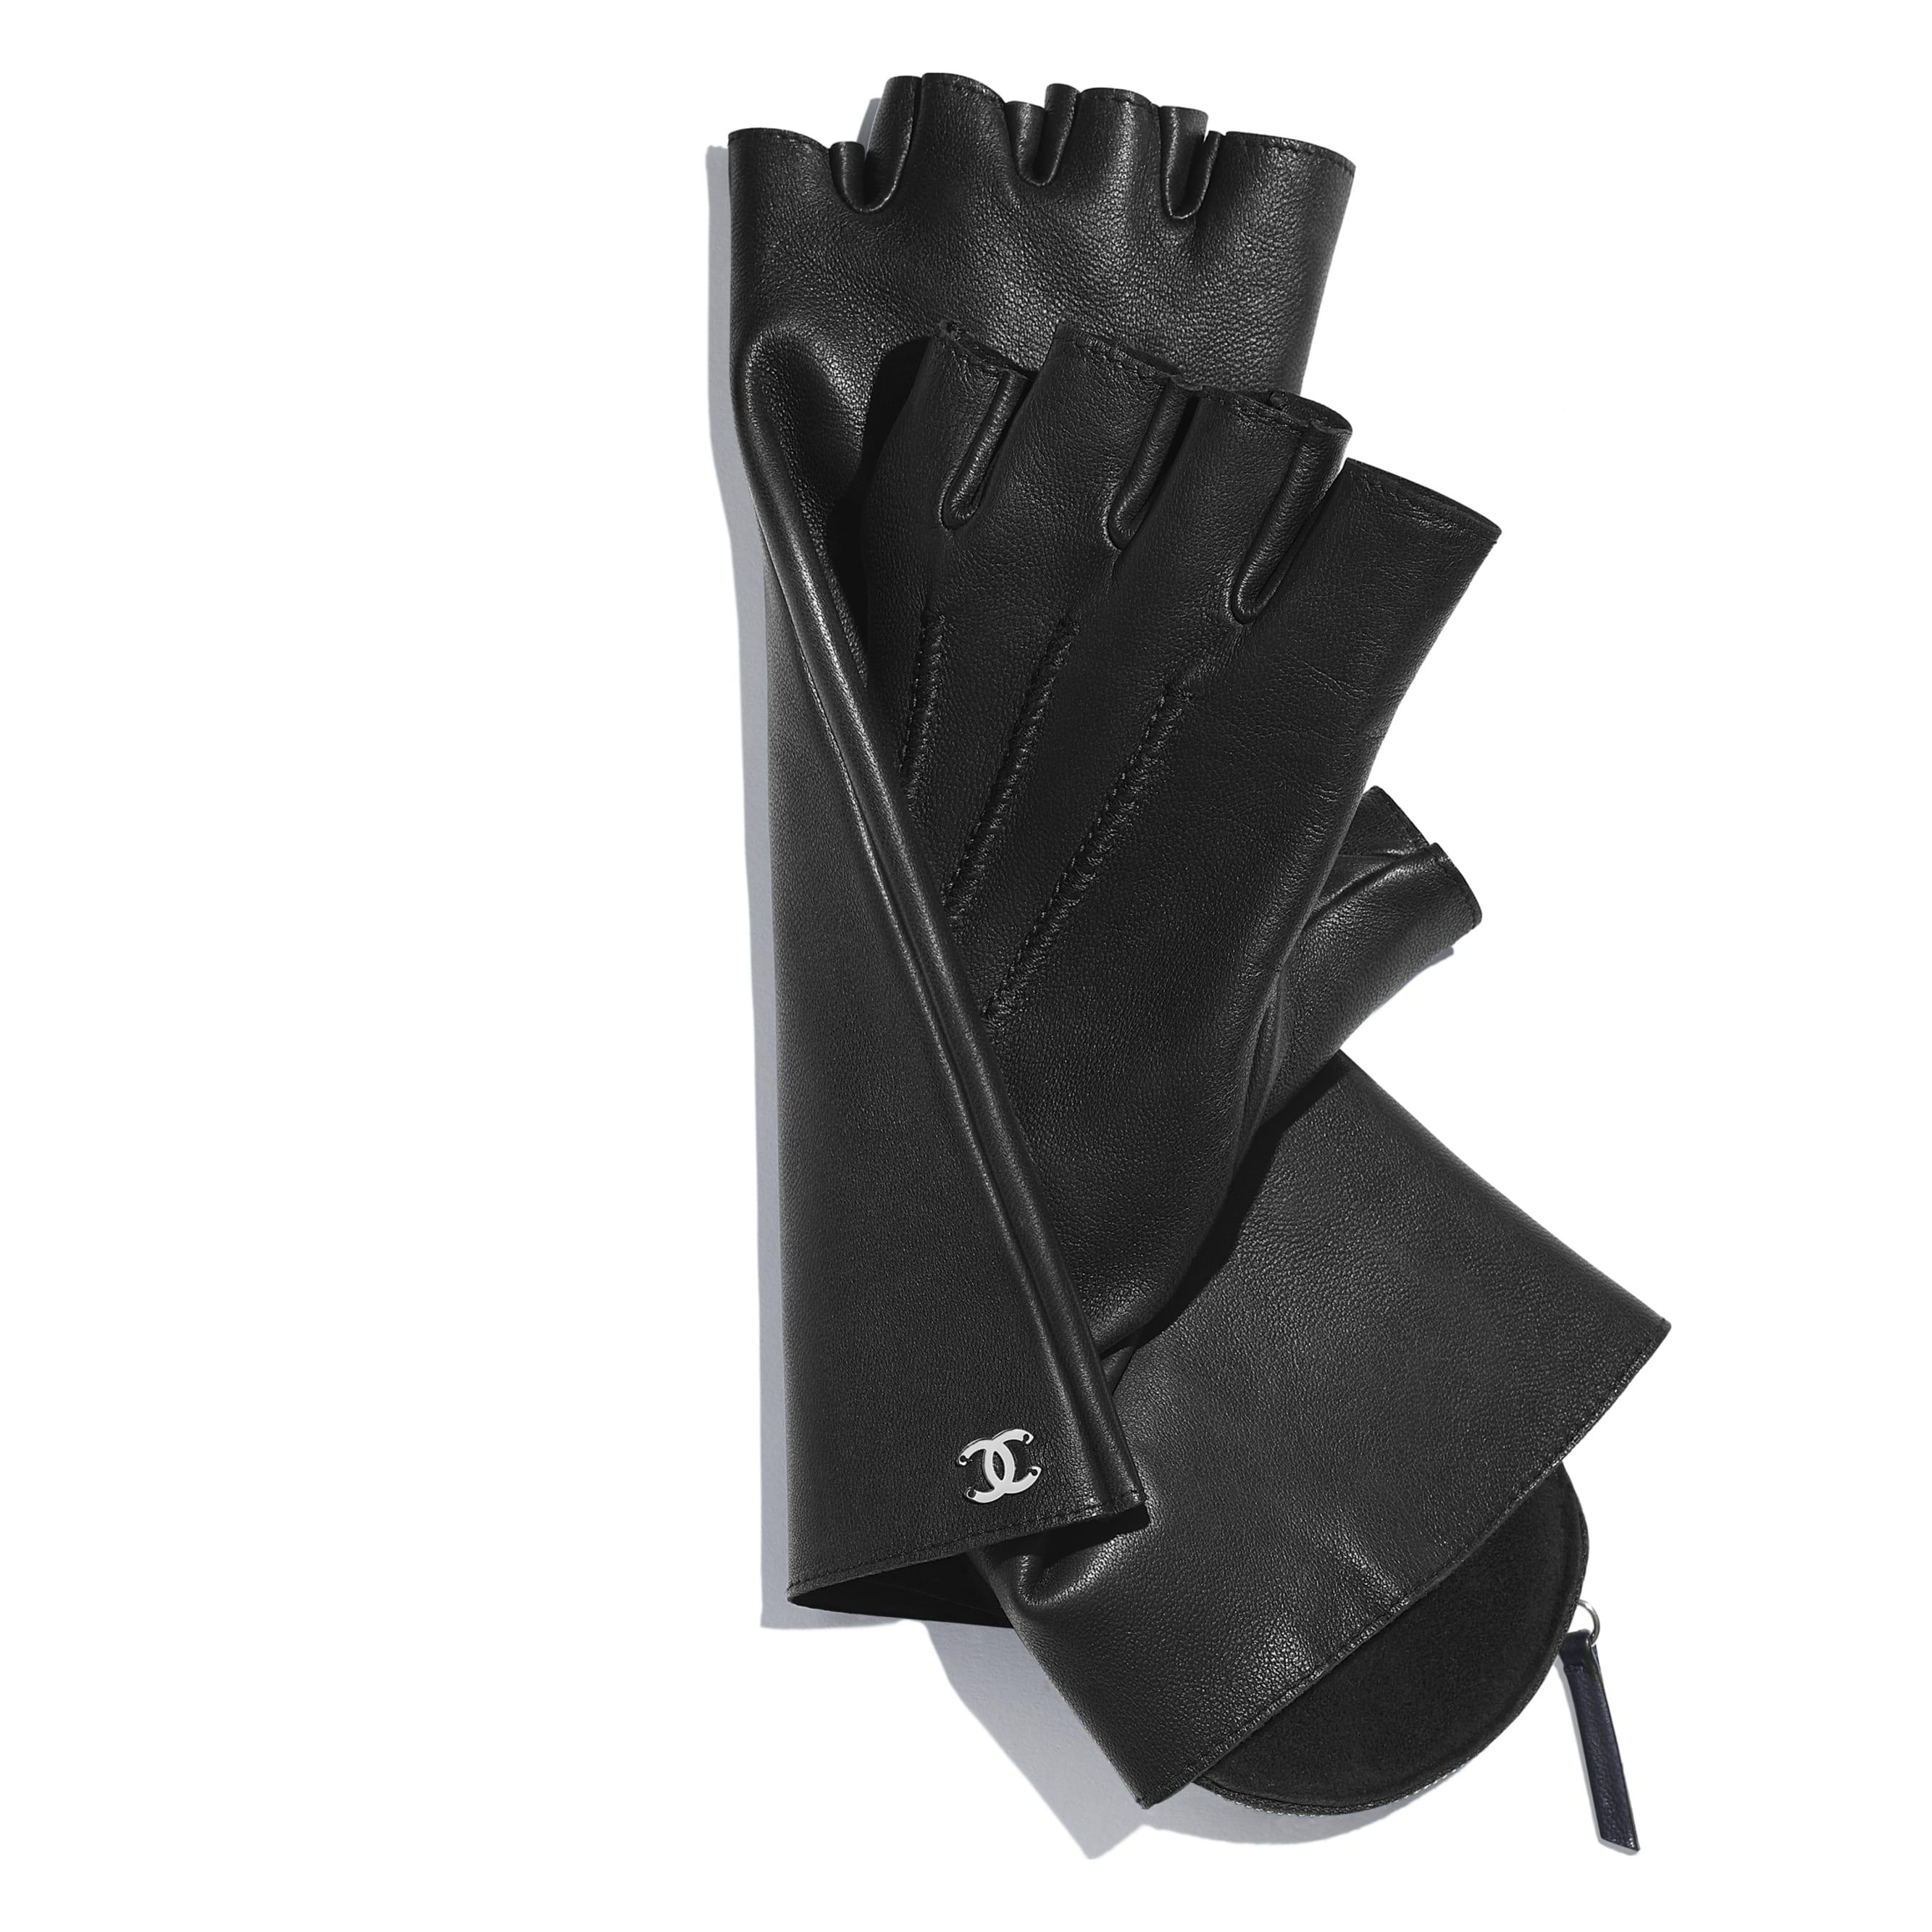 Gloves - Black - Lambskin & Silver-Tone Metal - Alternative view - see standard sized version